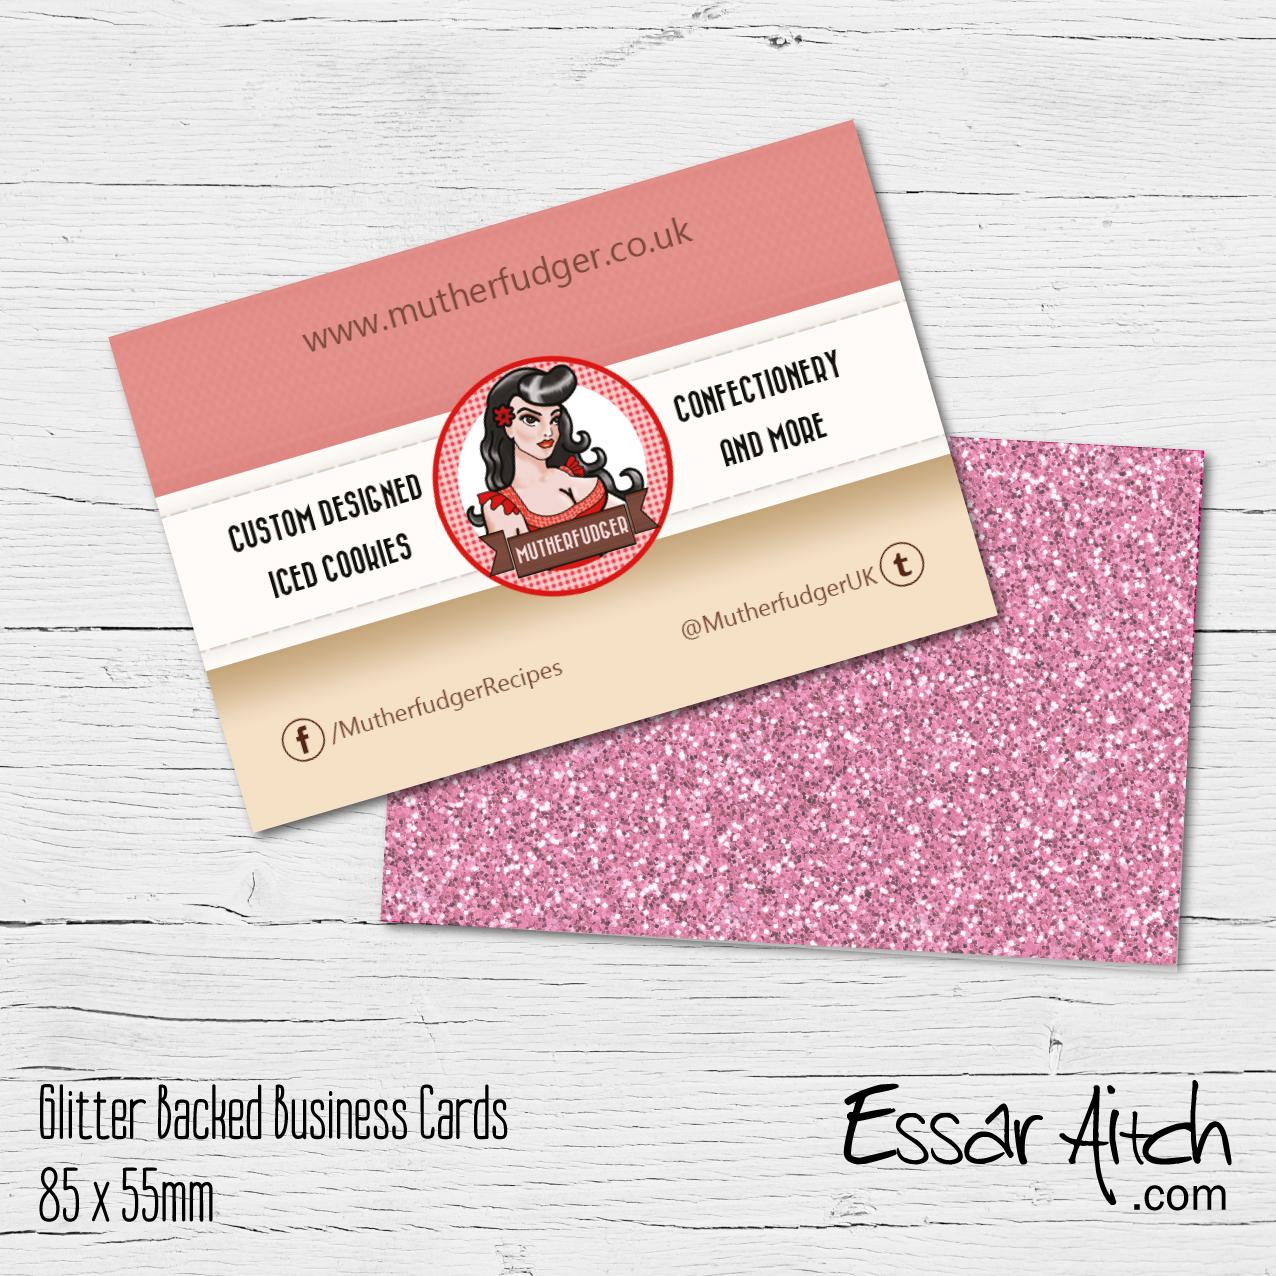 Glitter backed business cards essar aitch glitter backed business cards reheart Choice Image